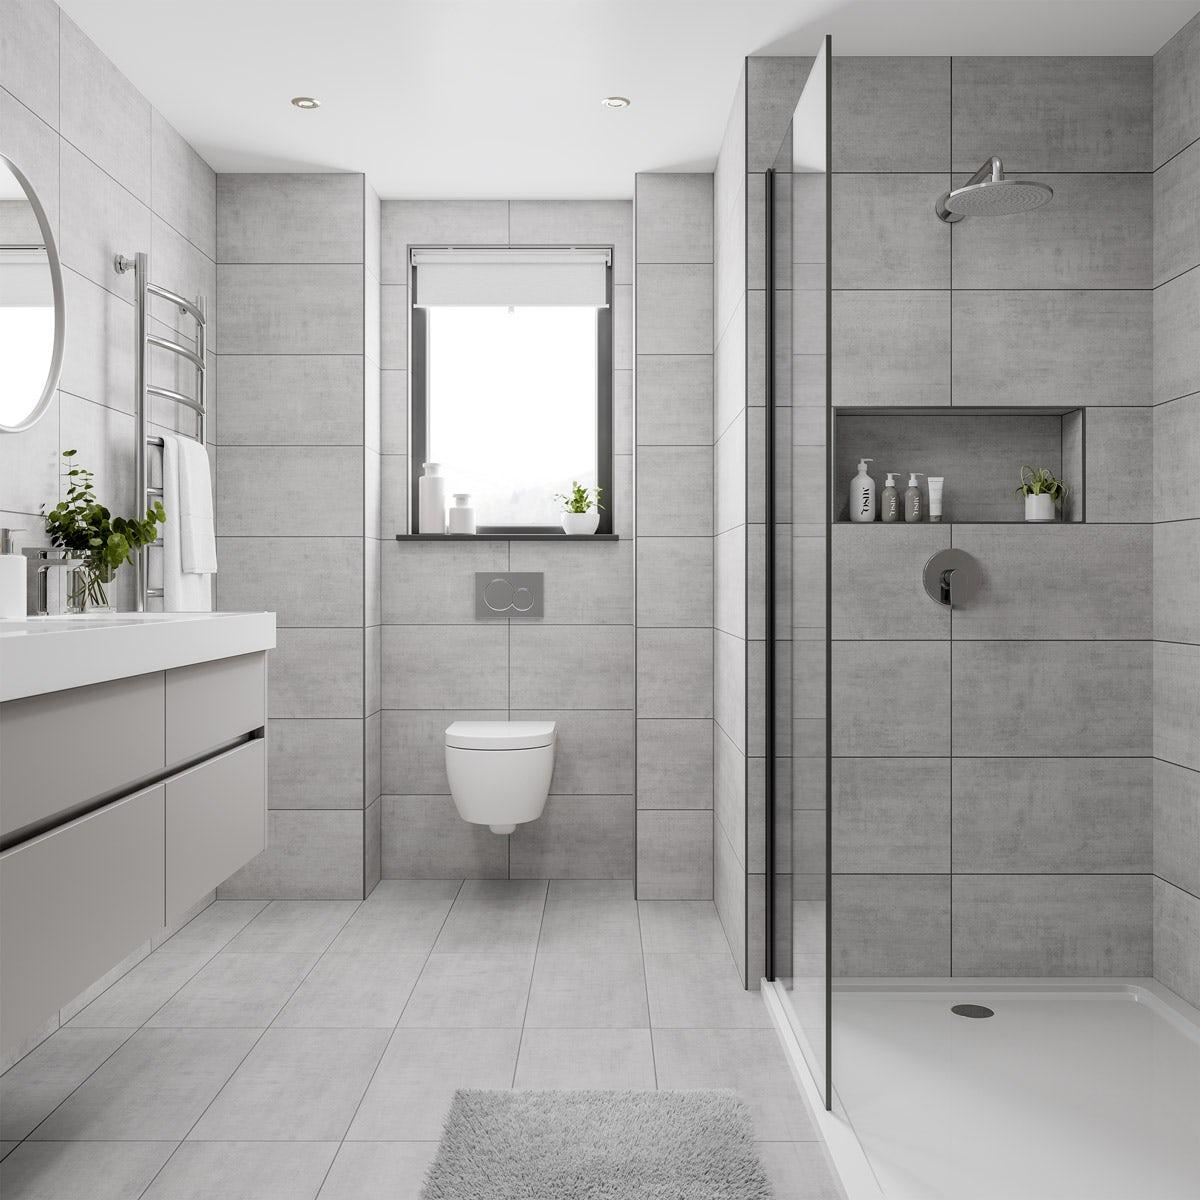 Floor Tiles Bathroom Grey - Image Of Bathroom And Closet